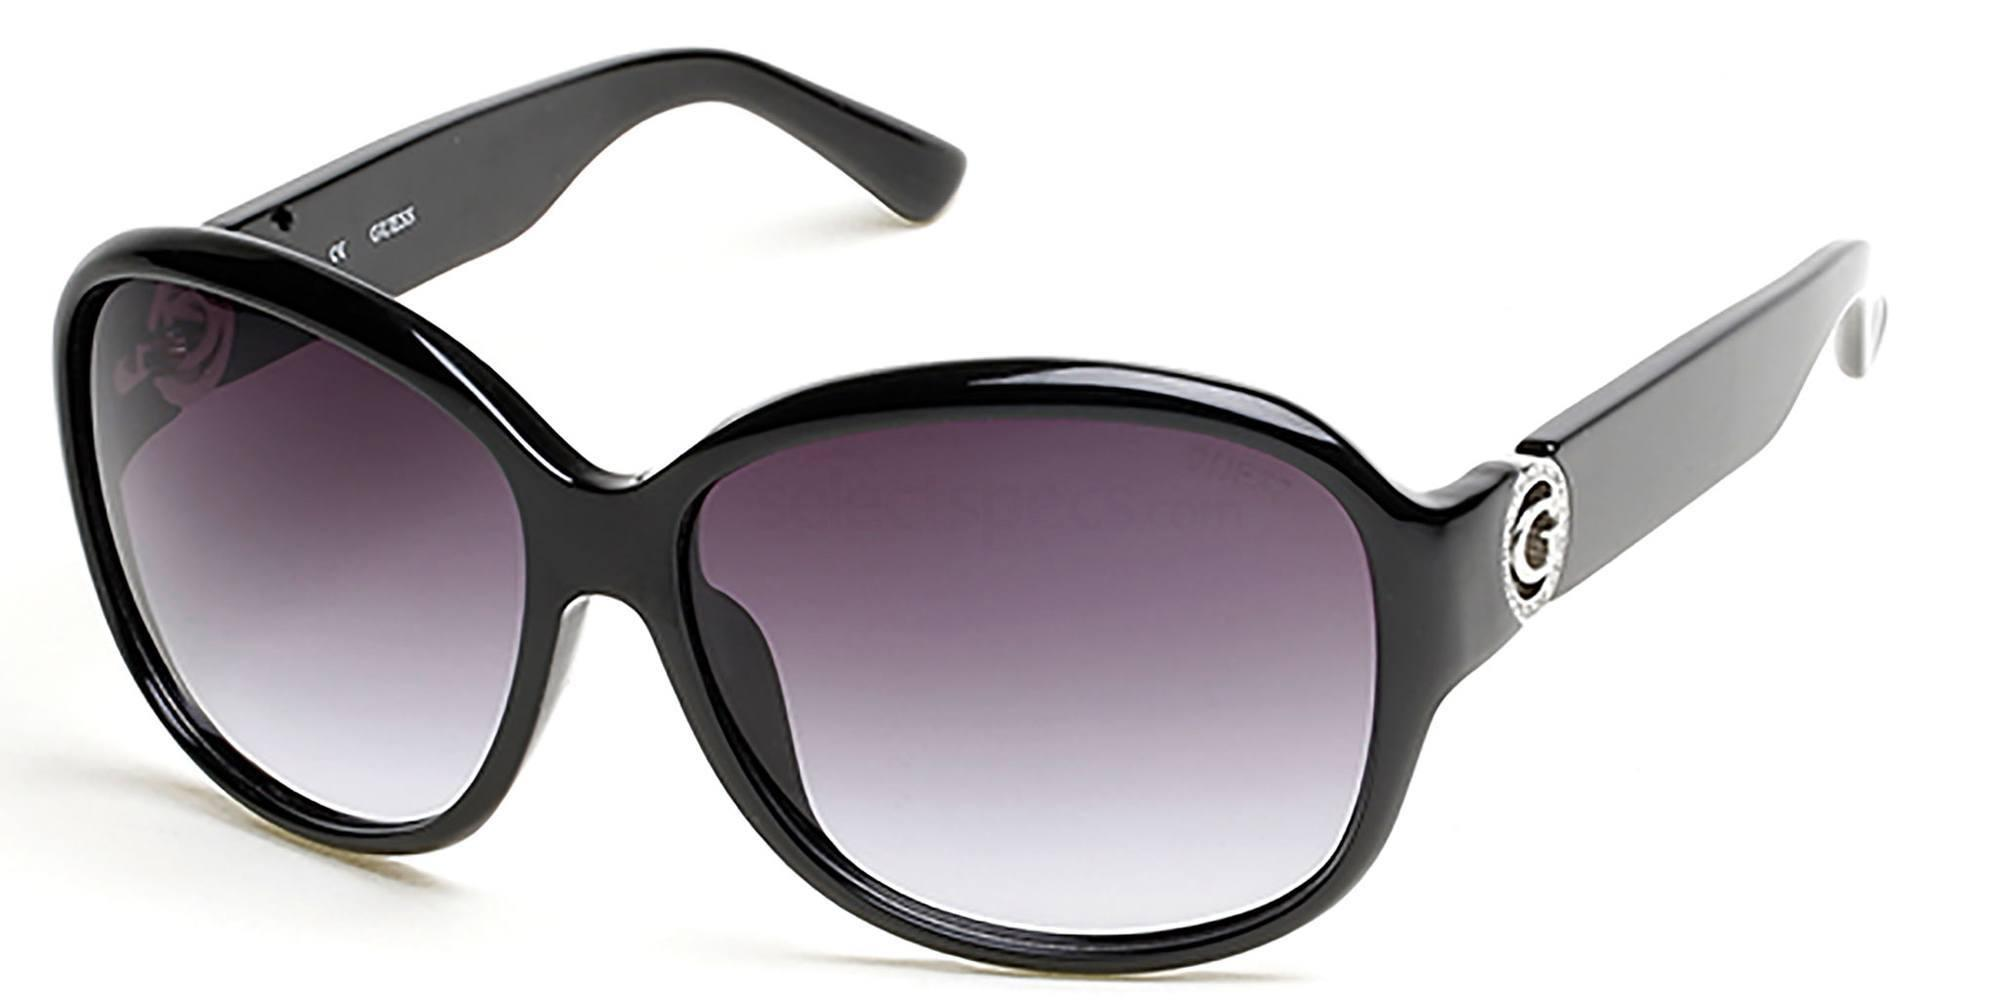 01B GU7406 Sunglasses, Guess